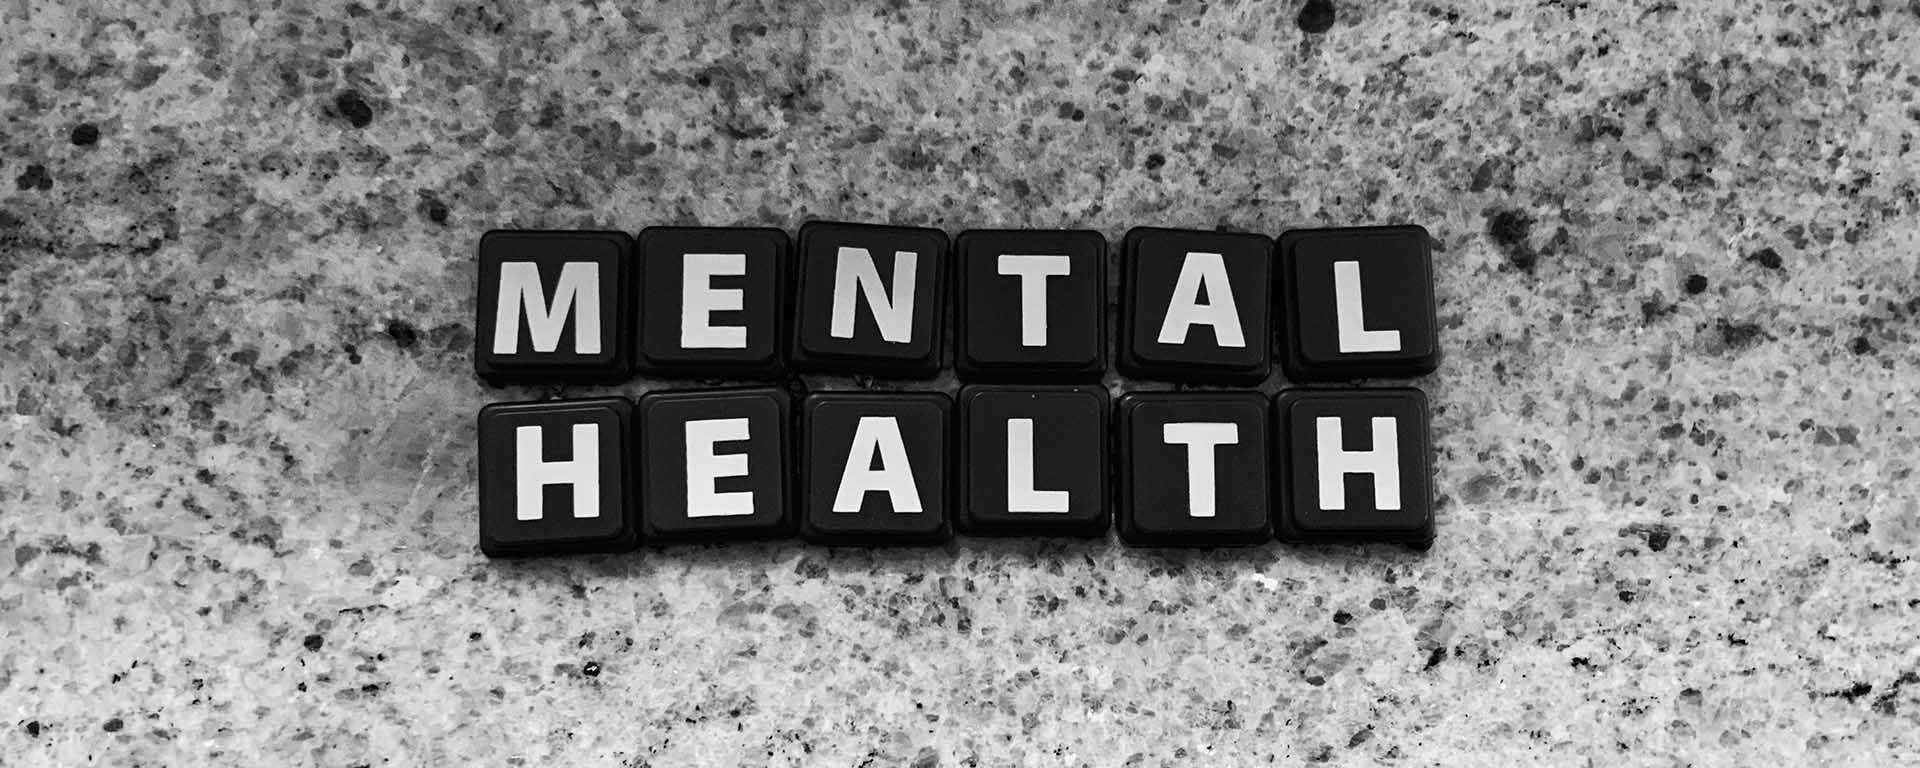 Letter tiles spell out: Mental health